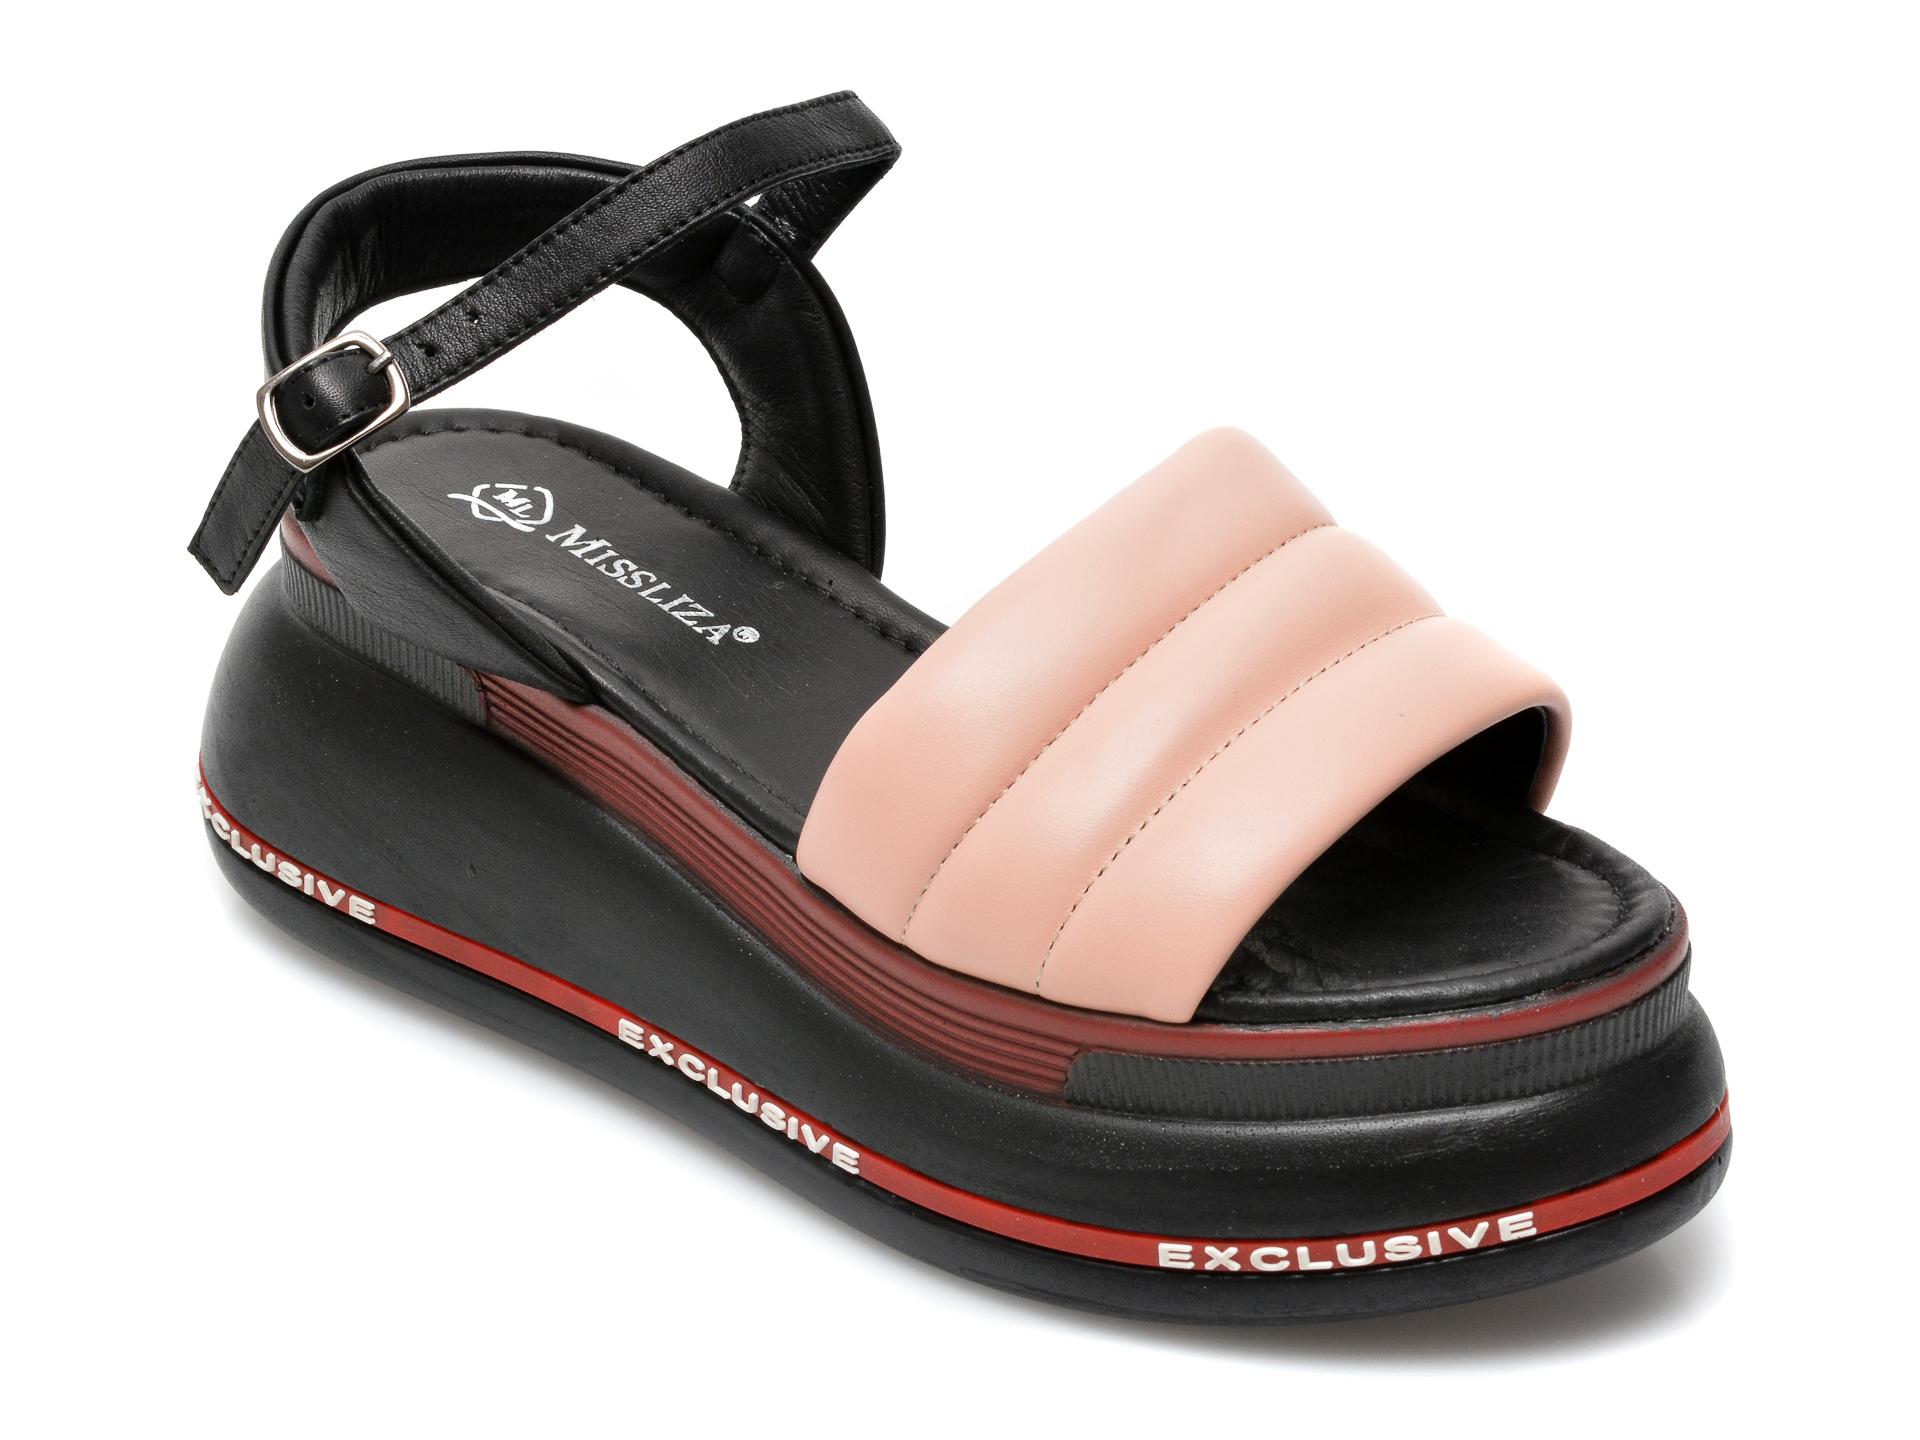 Sandale MISS LIZA nude, 2719, din piele naturala imagine otter.ro